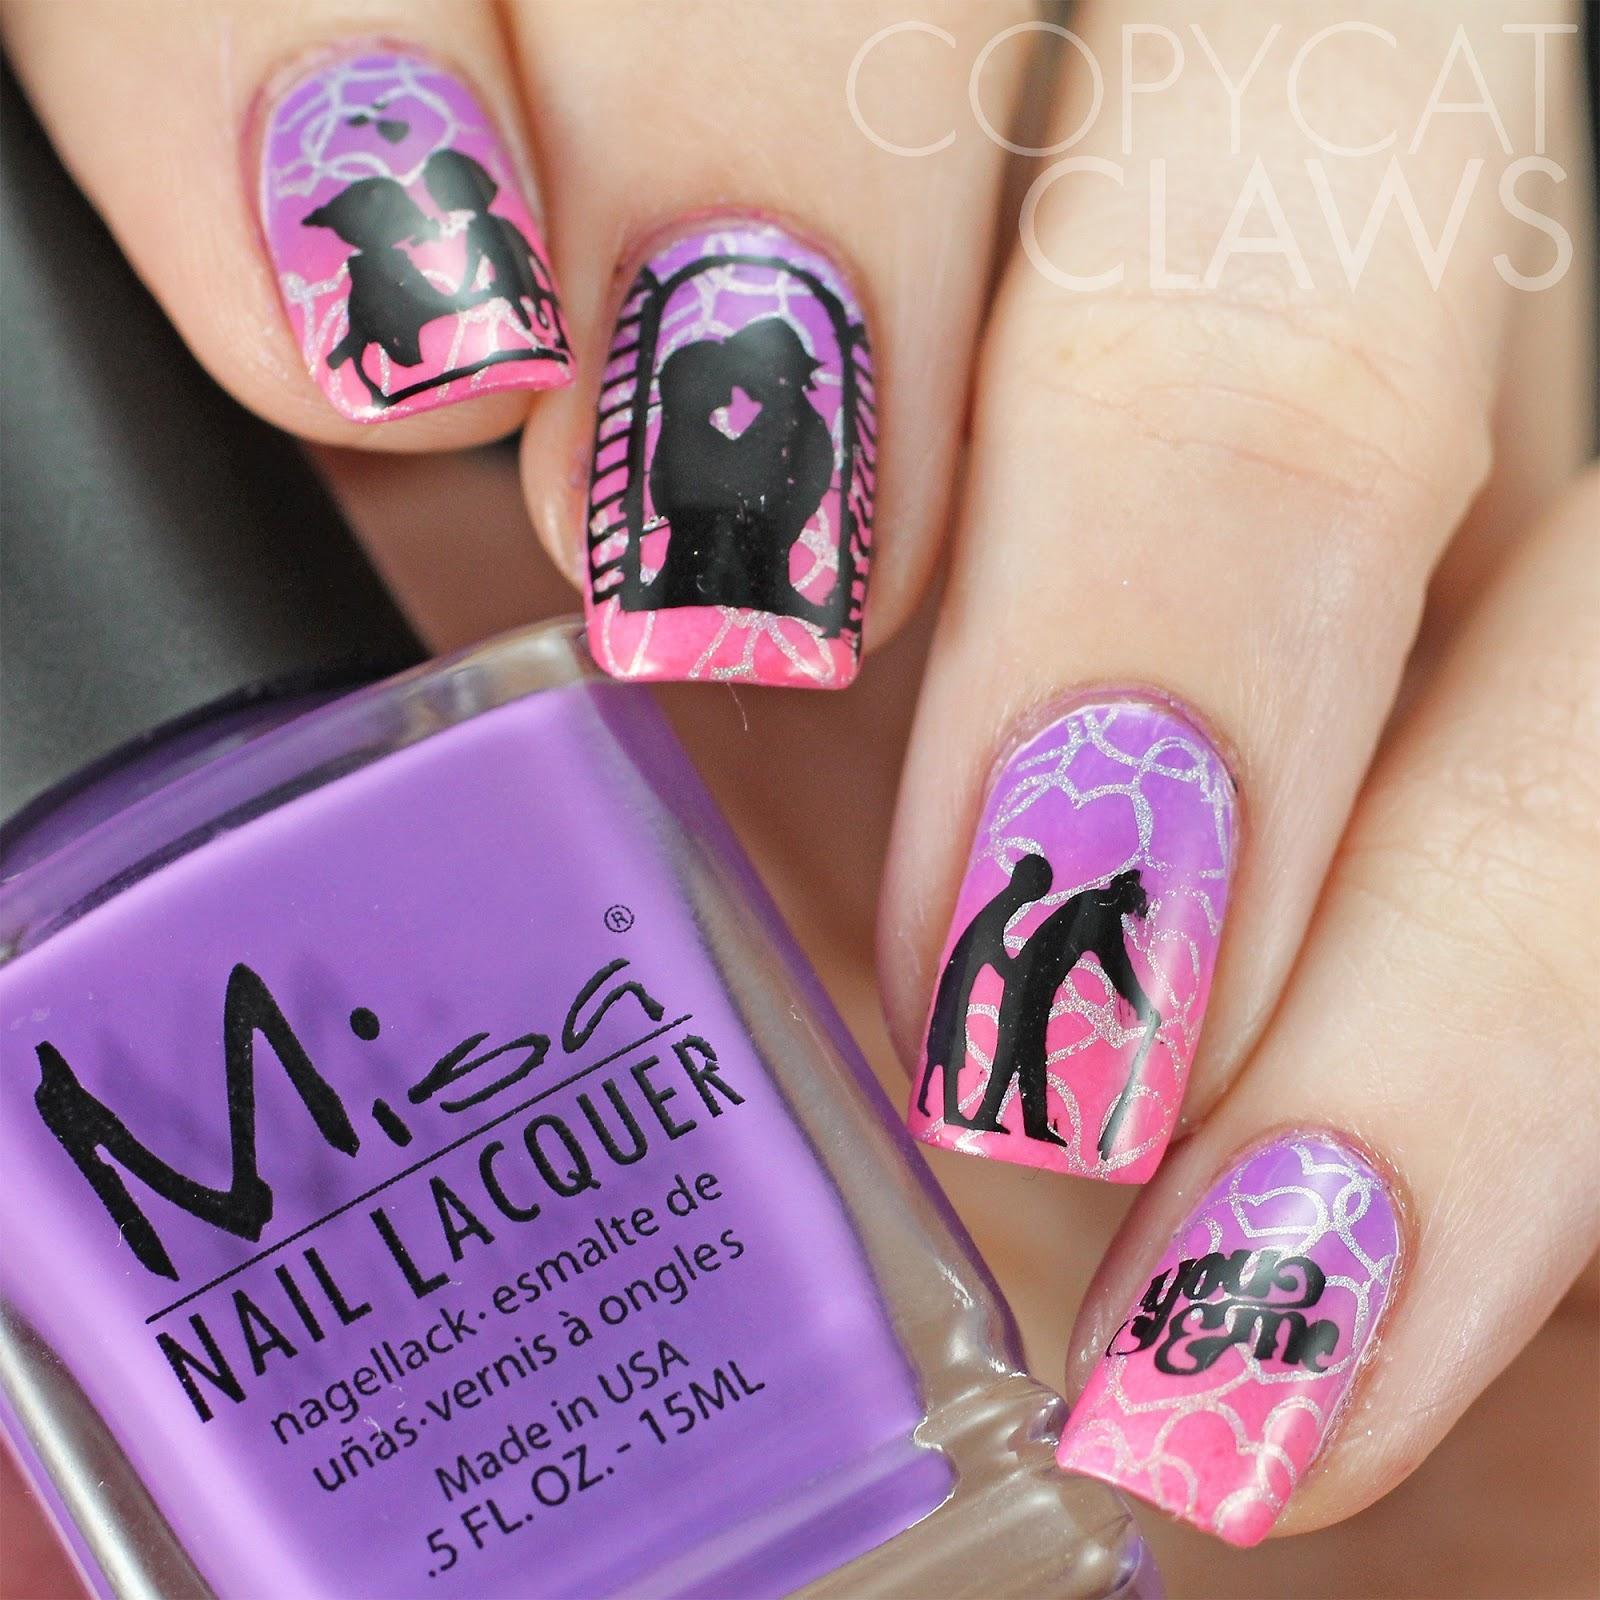 Copycat Claws 40 Great Nail Art Ideas Love